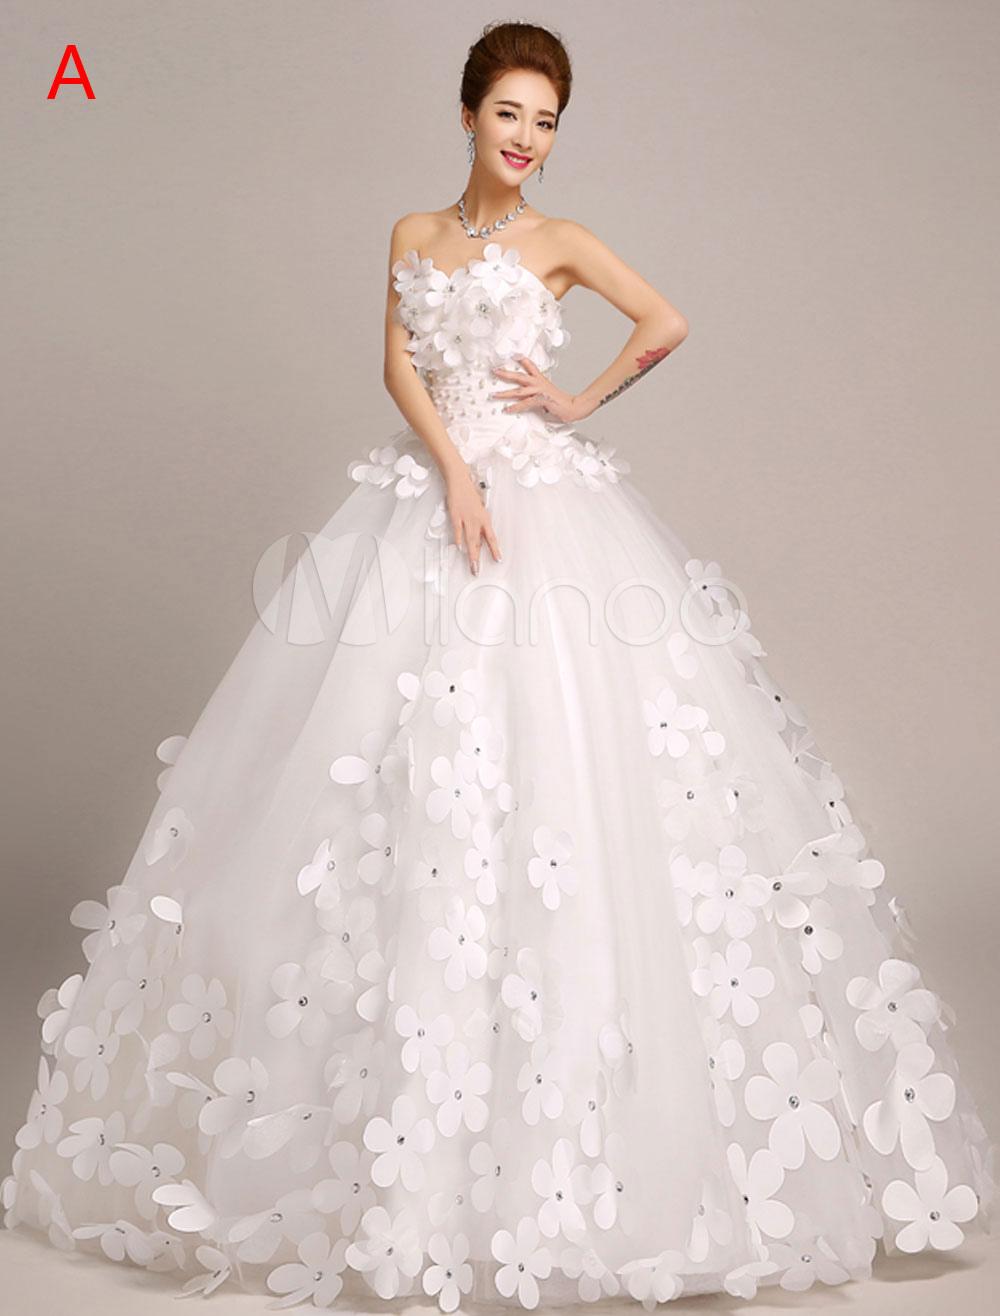 4e2b12886 Vestido de novia princesa Con cola con escote palabra de honor sin mangas  De banda de ...